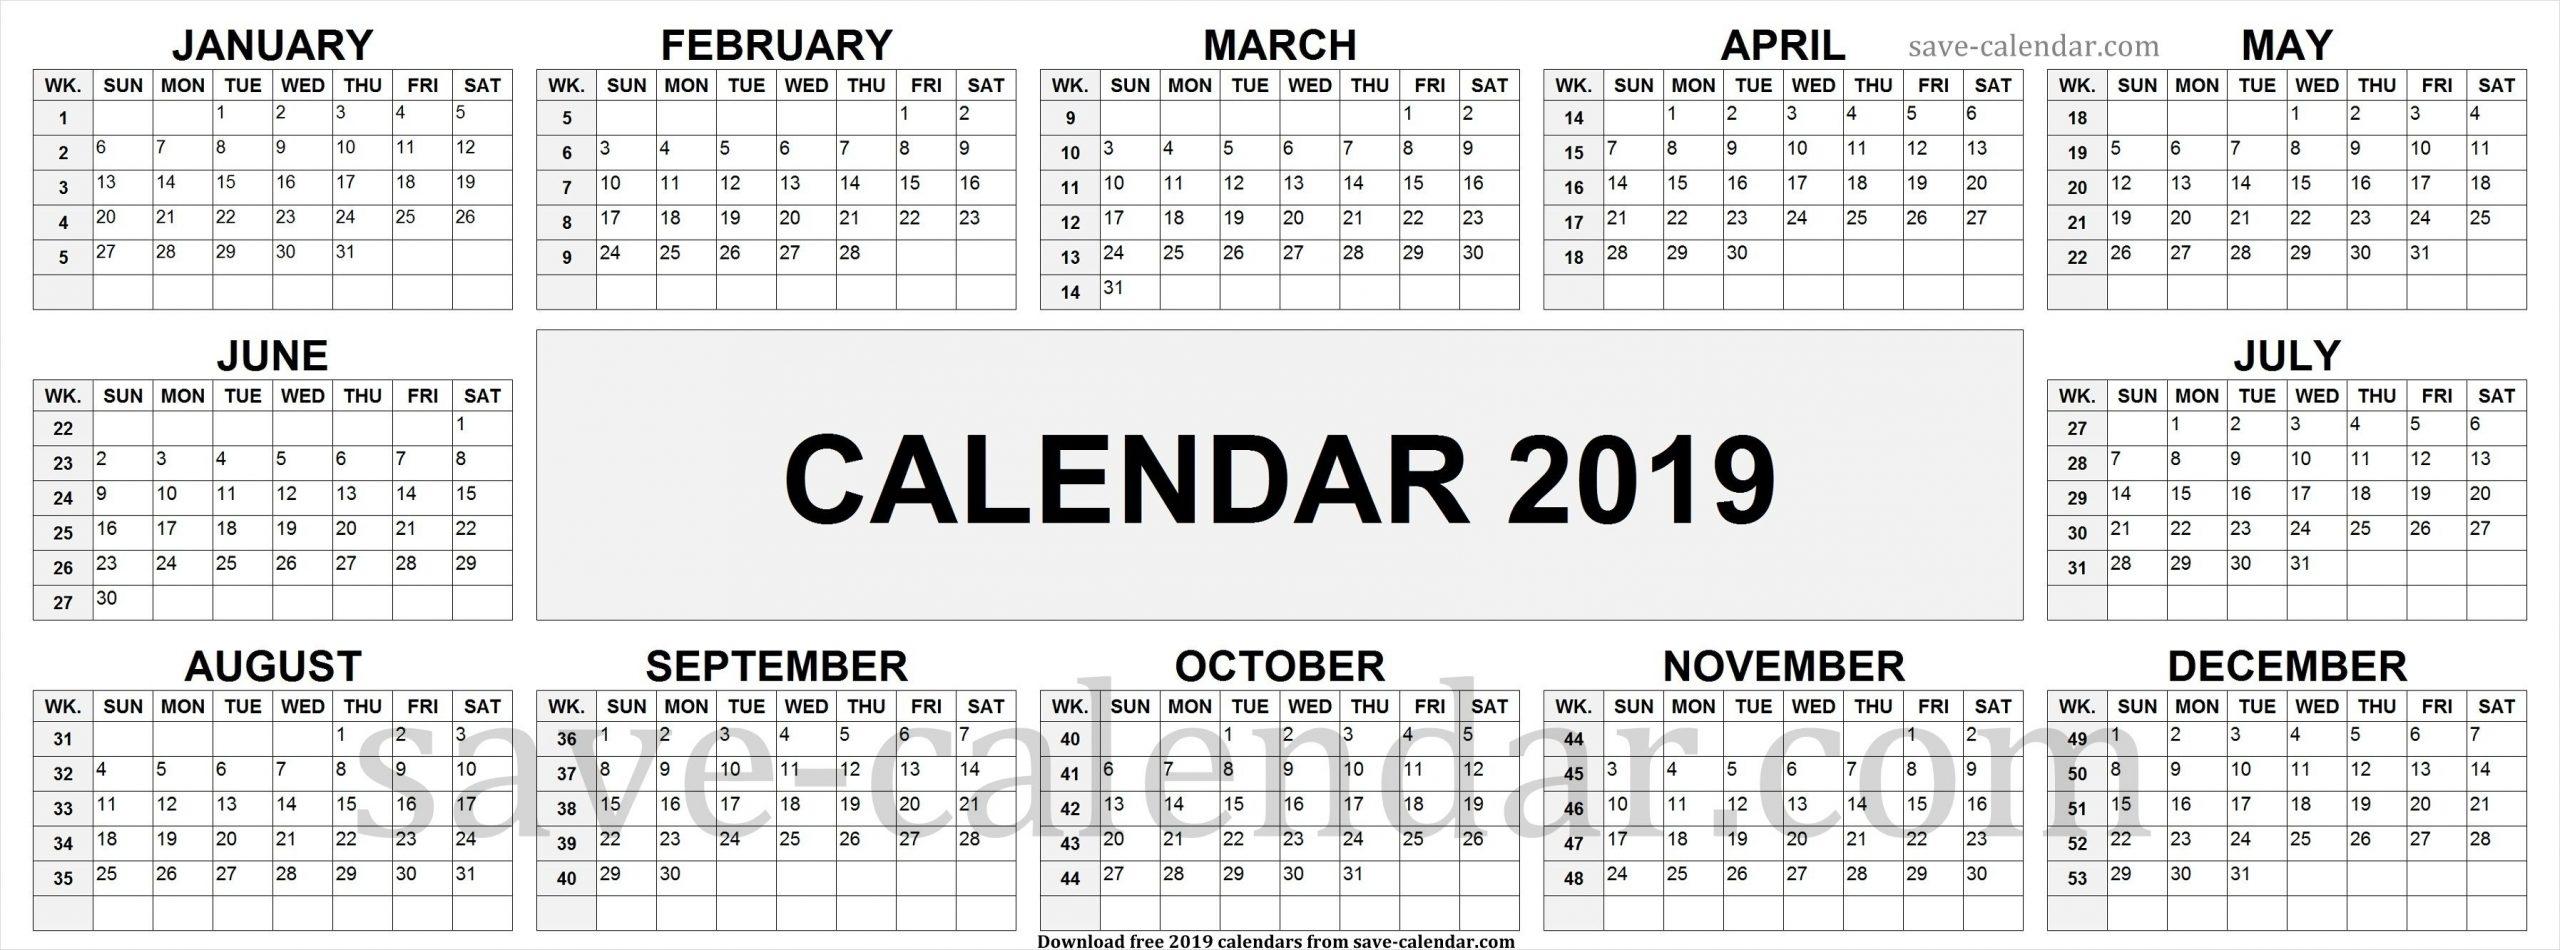 Take 2021 Depo Provera Dosing Calendar